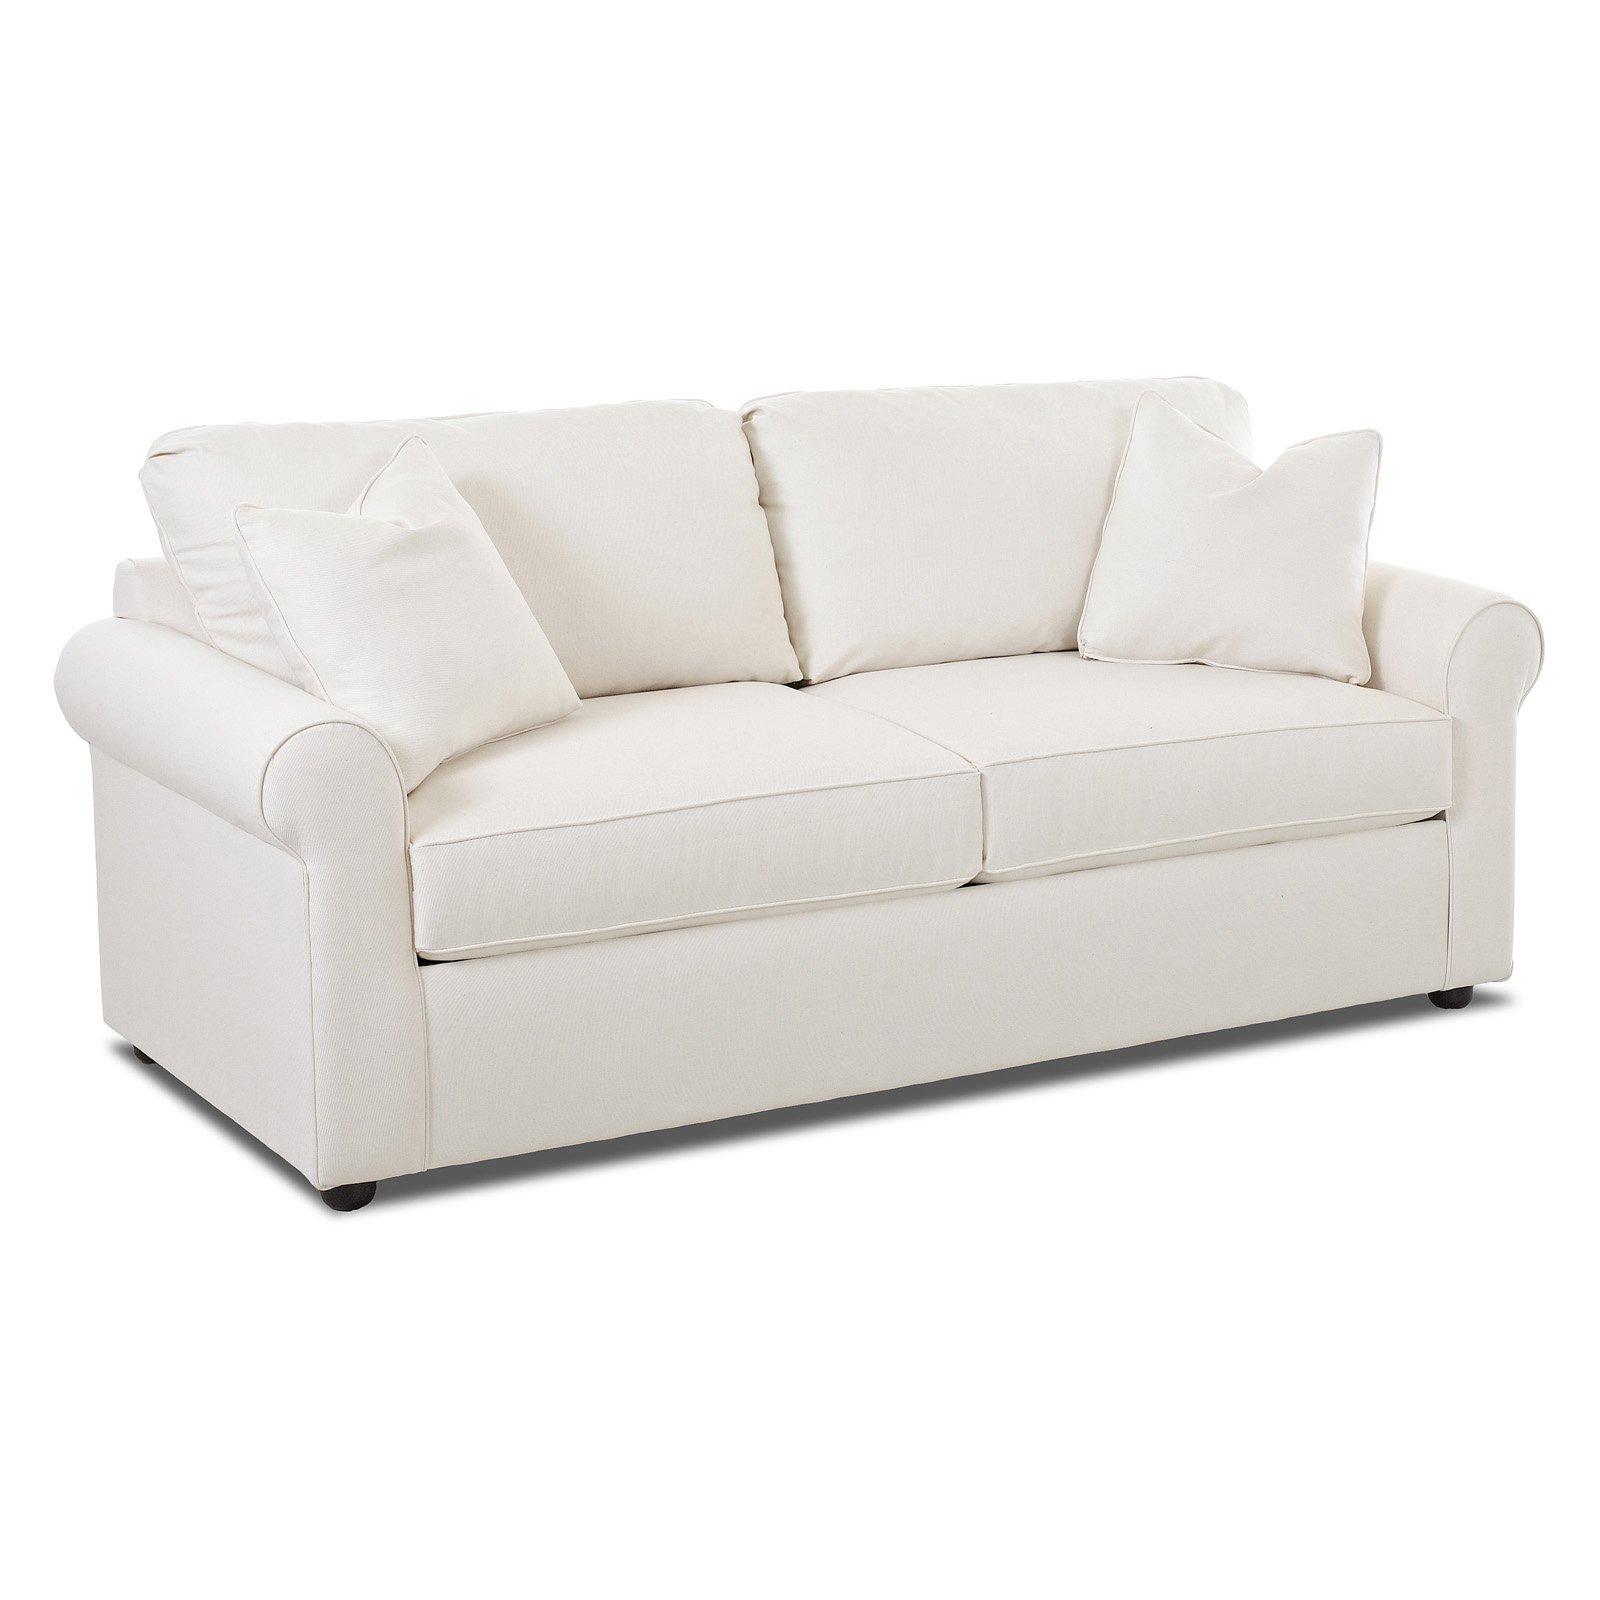 Klaussner Brighton Dreamquest Sleeper Sofa by Klaussner Furniture Industries